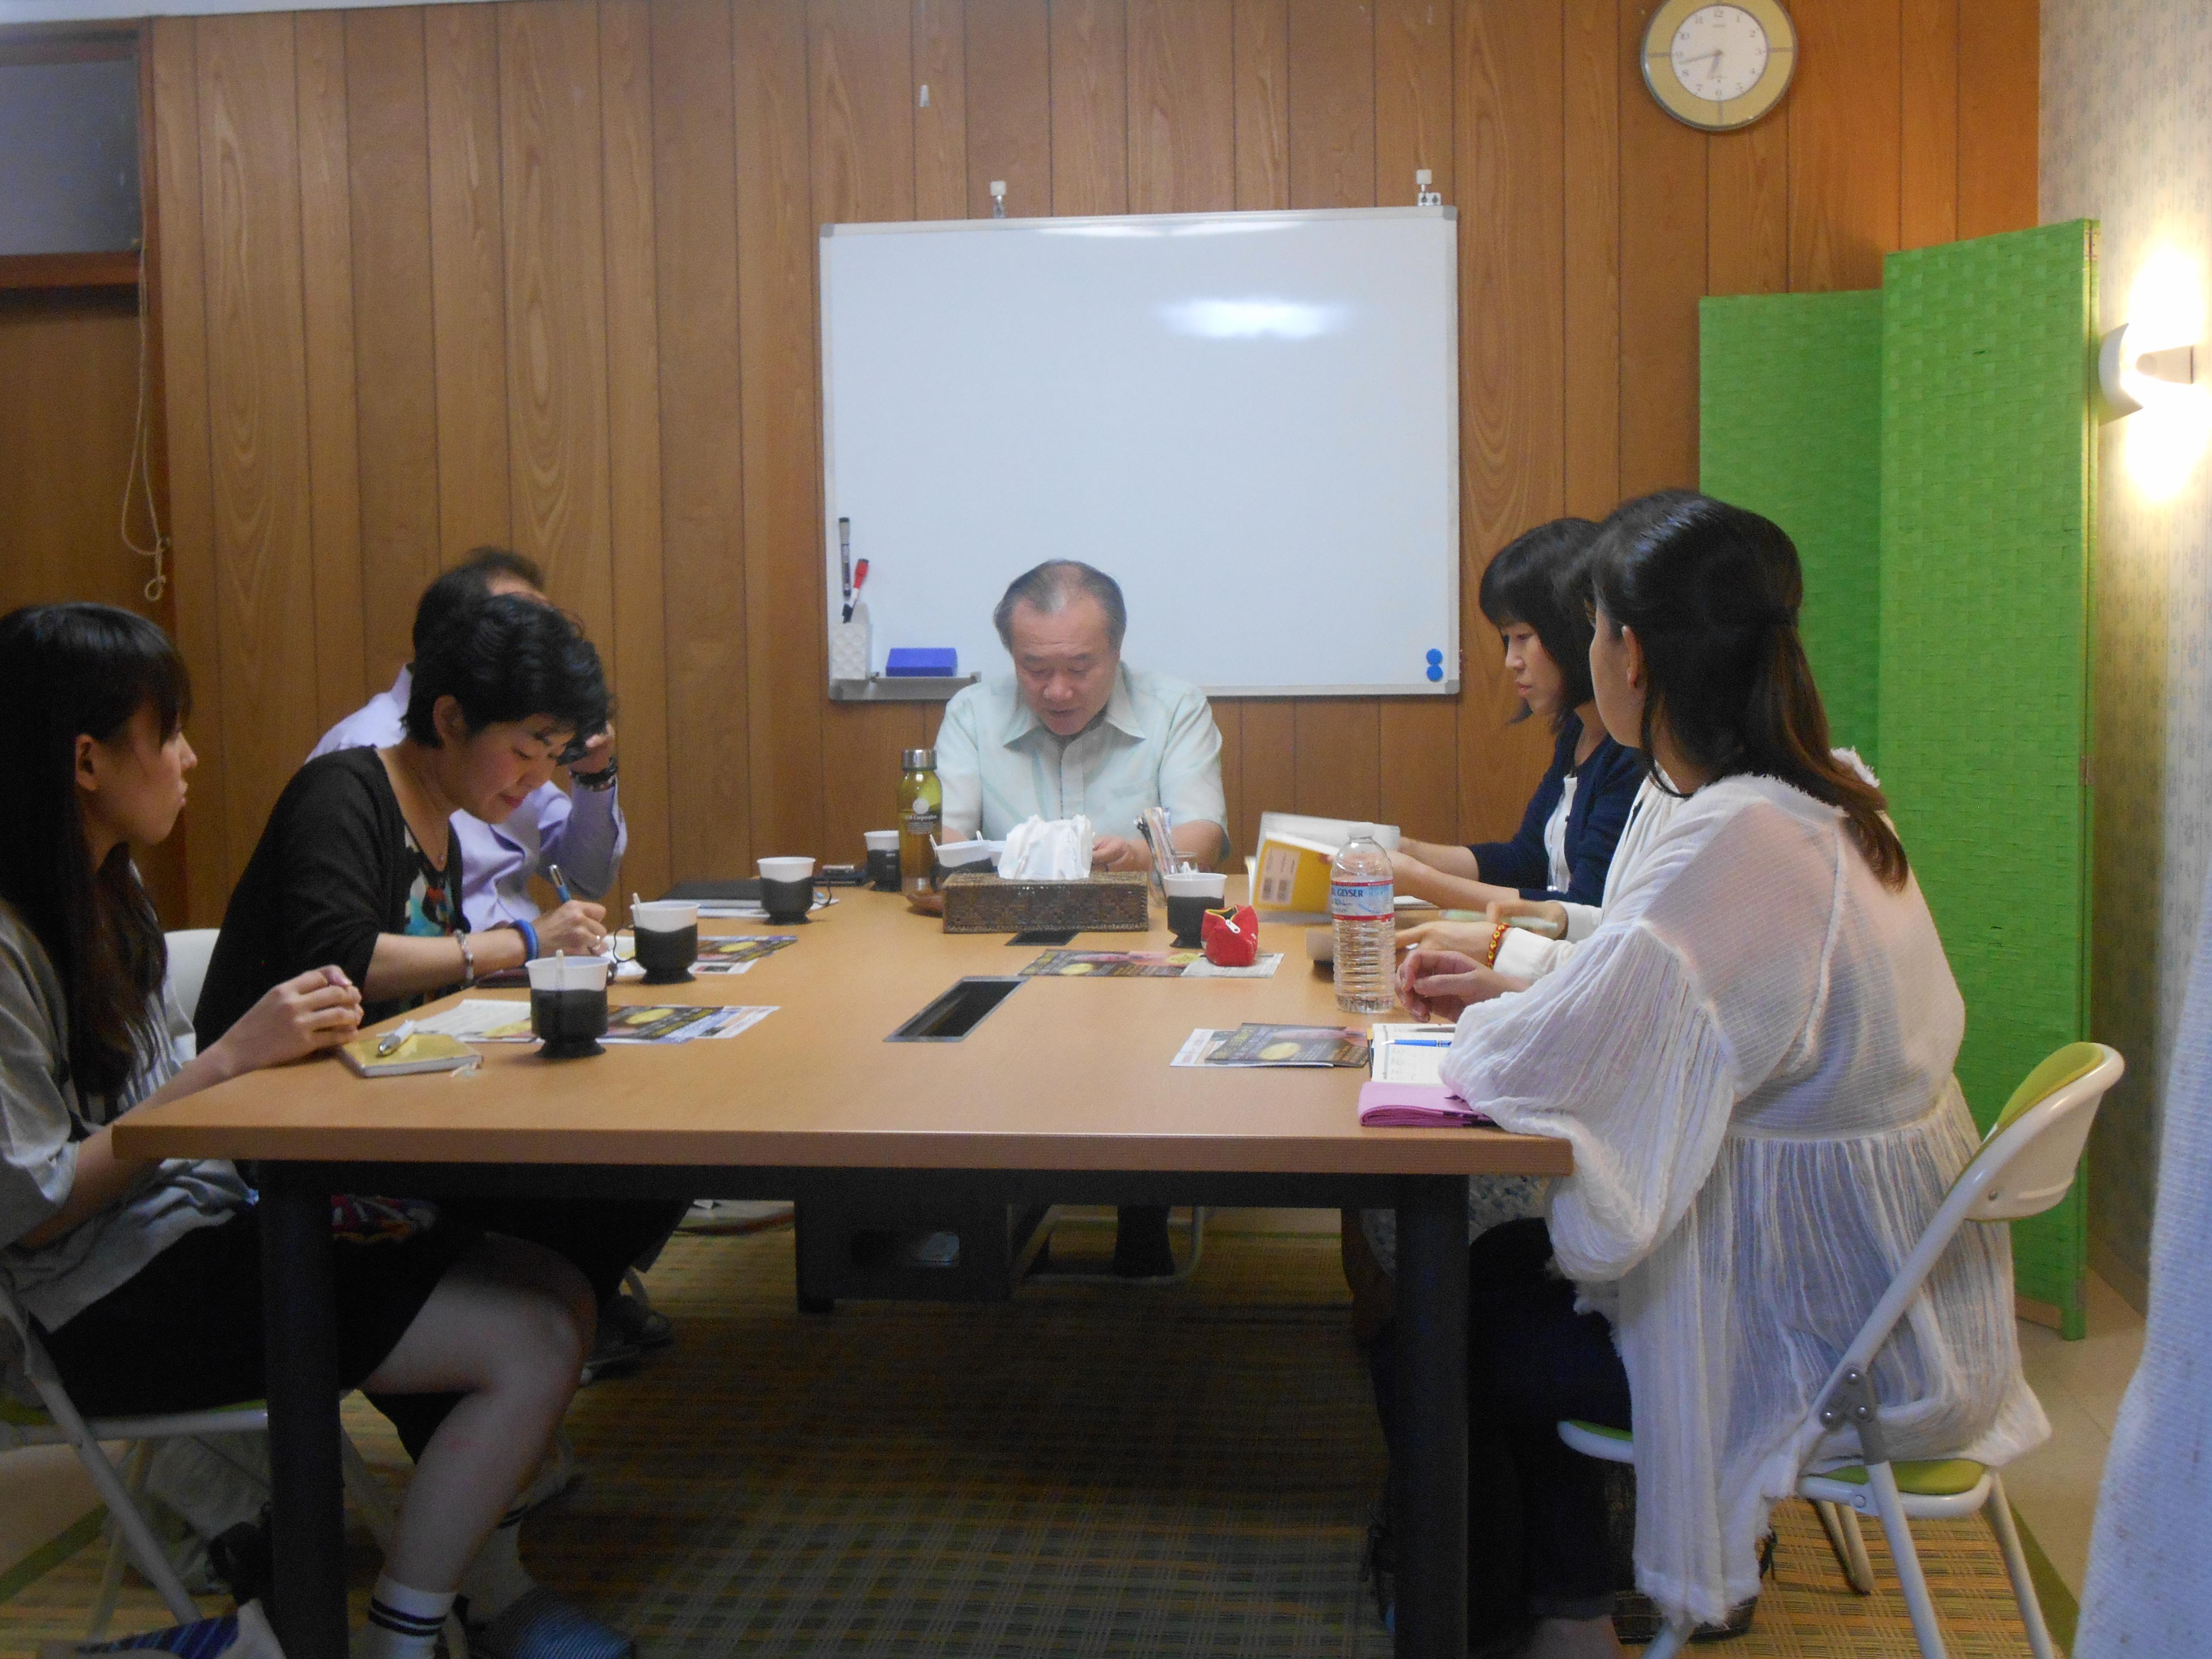 DSCN4876 - 池川先生から教えて頂いた令和の時代の生き方